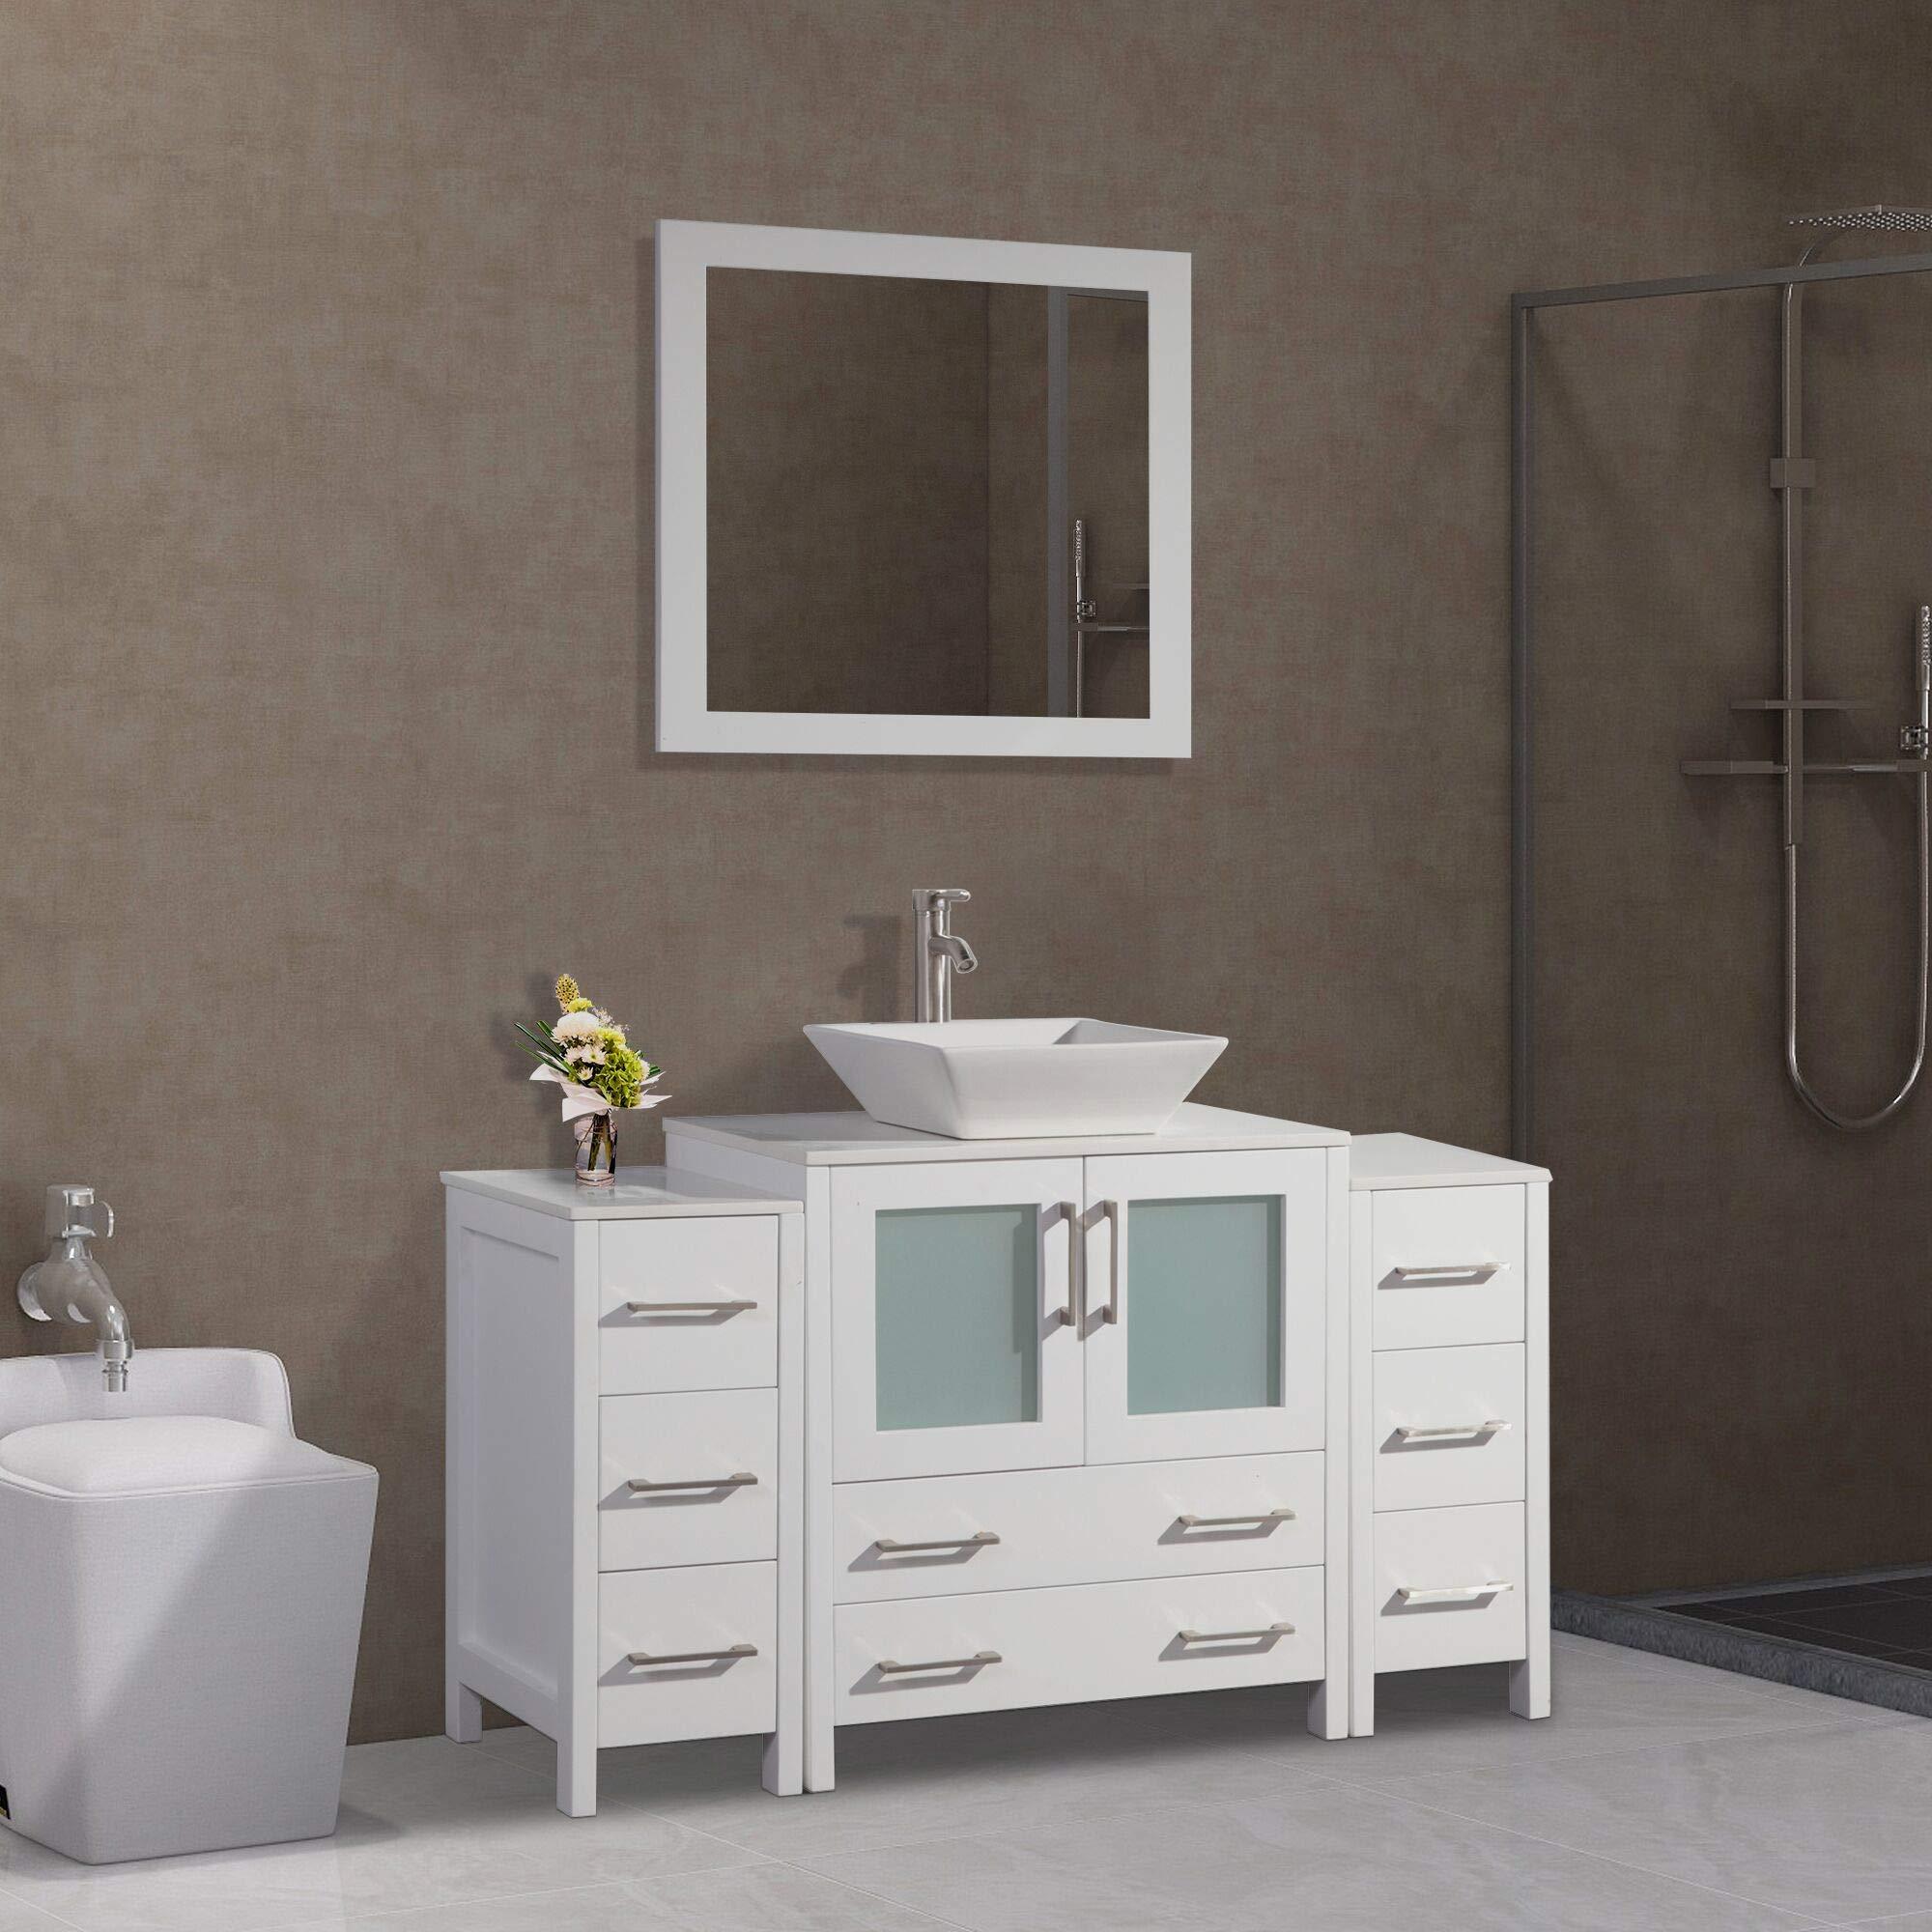 Vanity Art 54 inch Single Sink Bathroom Vanity Combo Set 8 ...